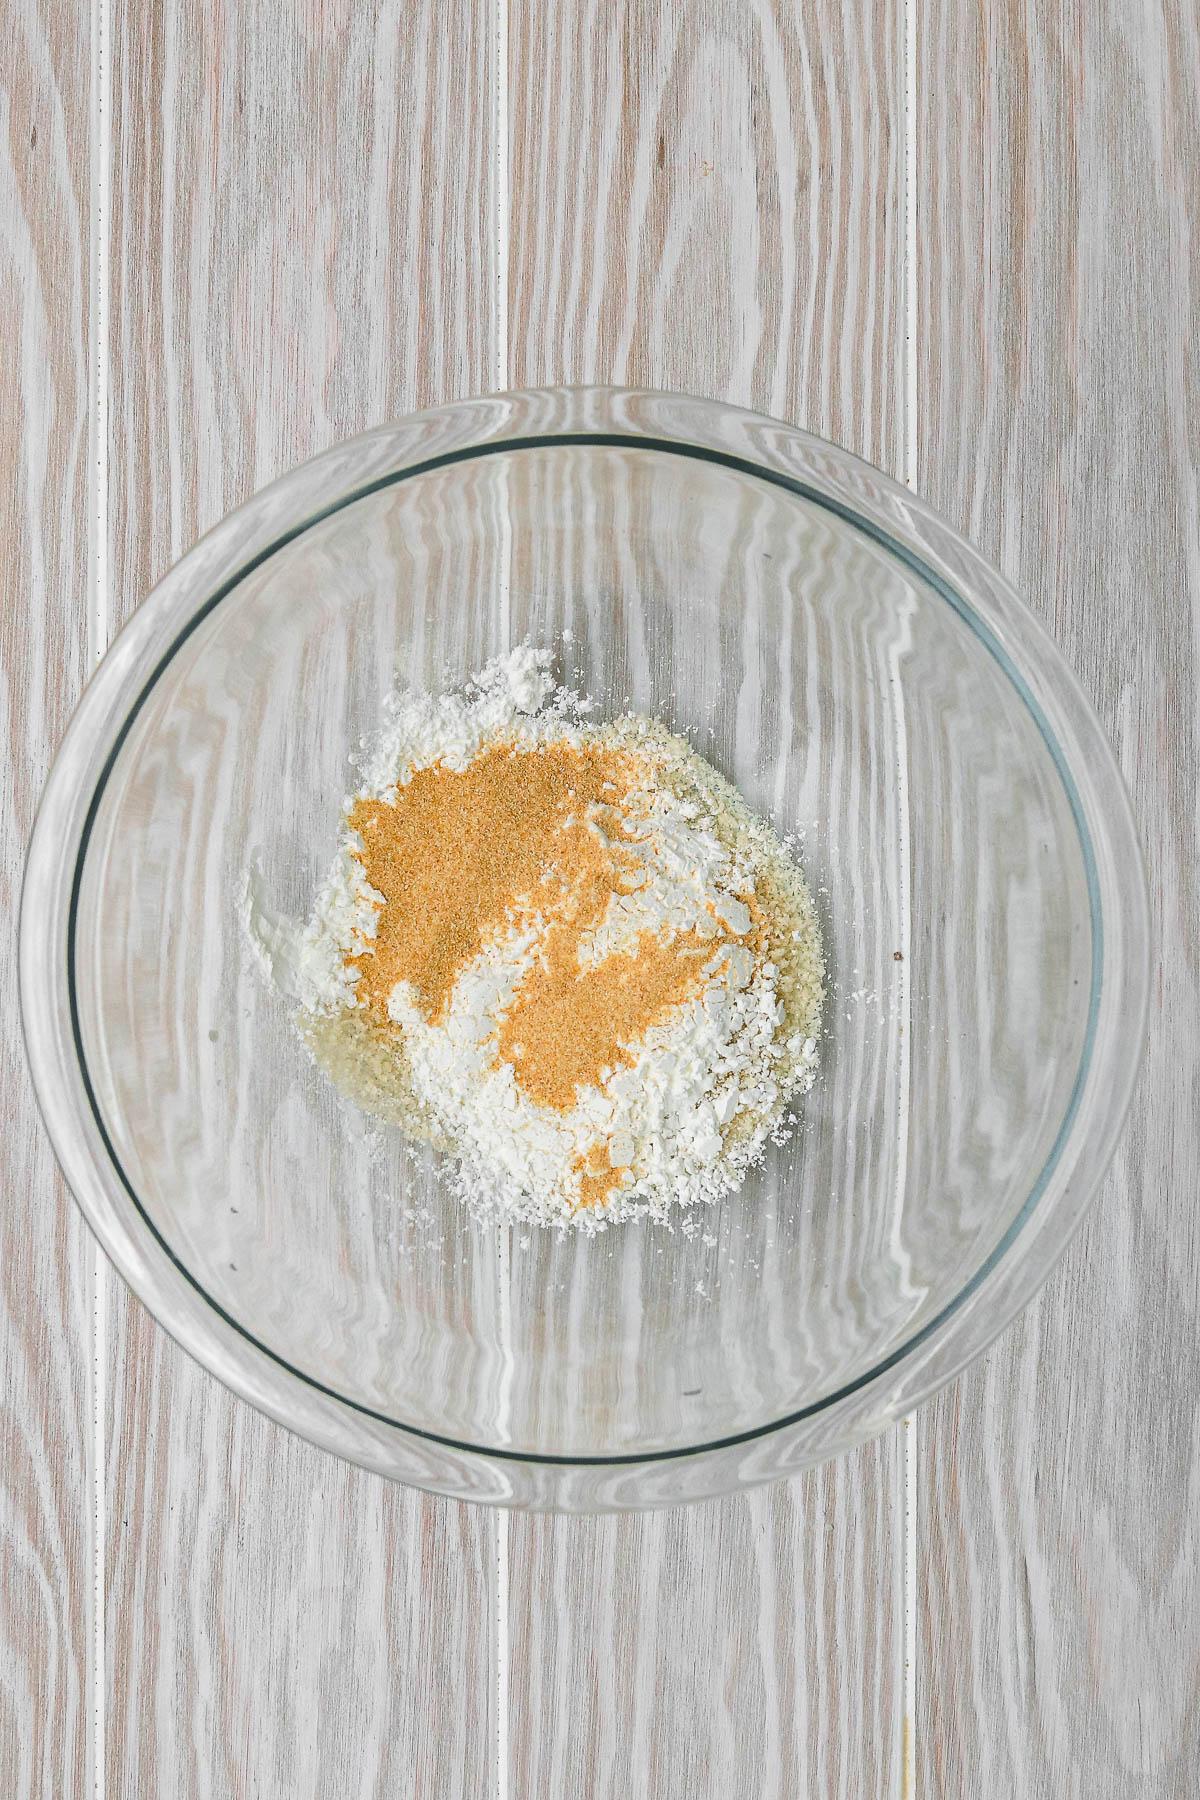 panko, cornstarch, and garlic powder in a glass bowl.